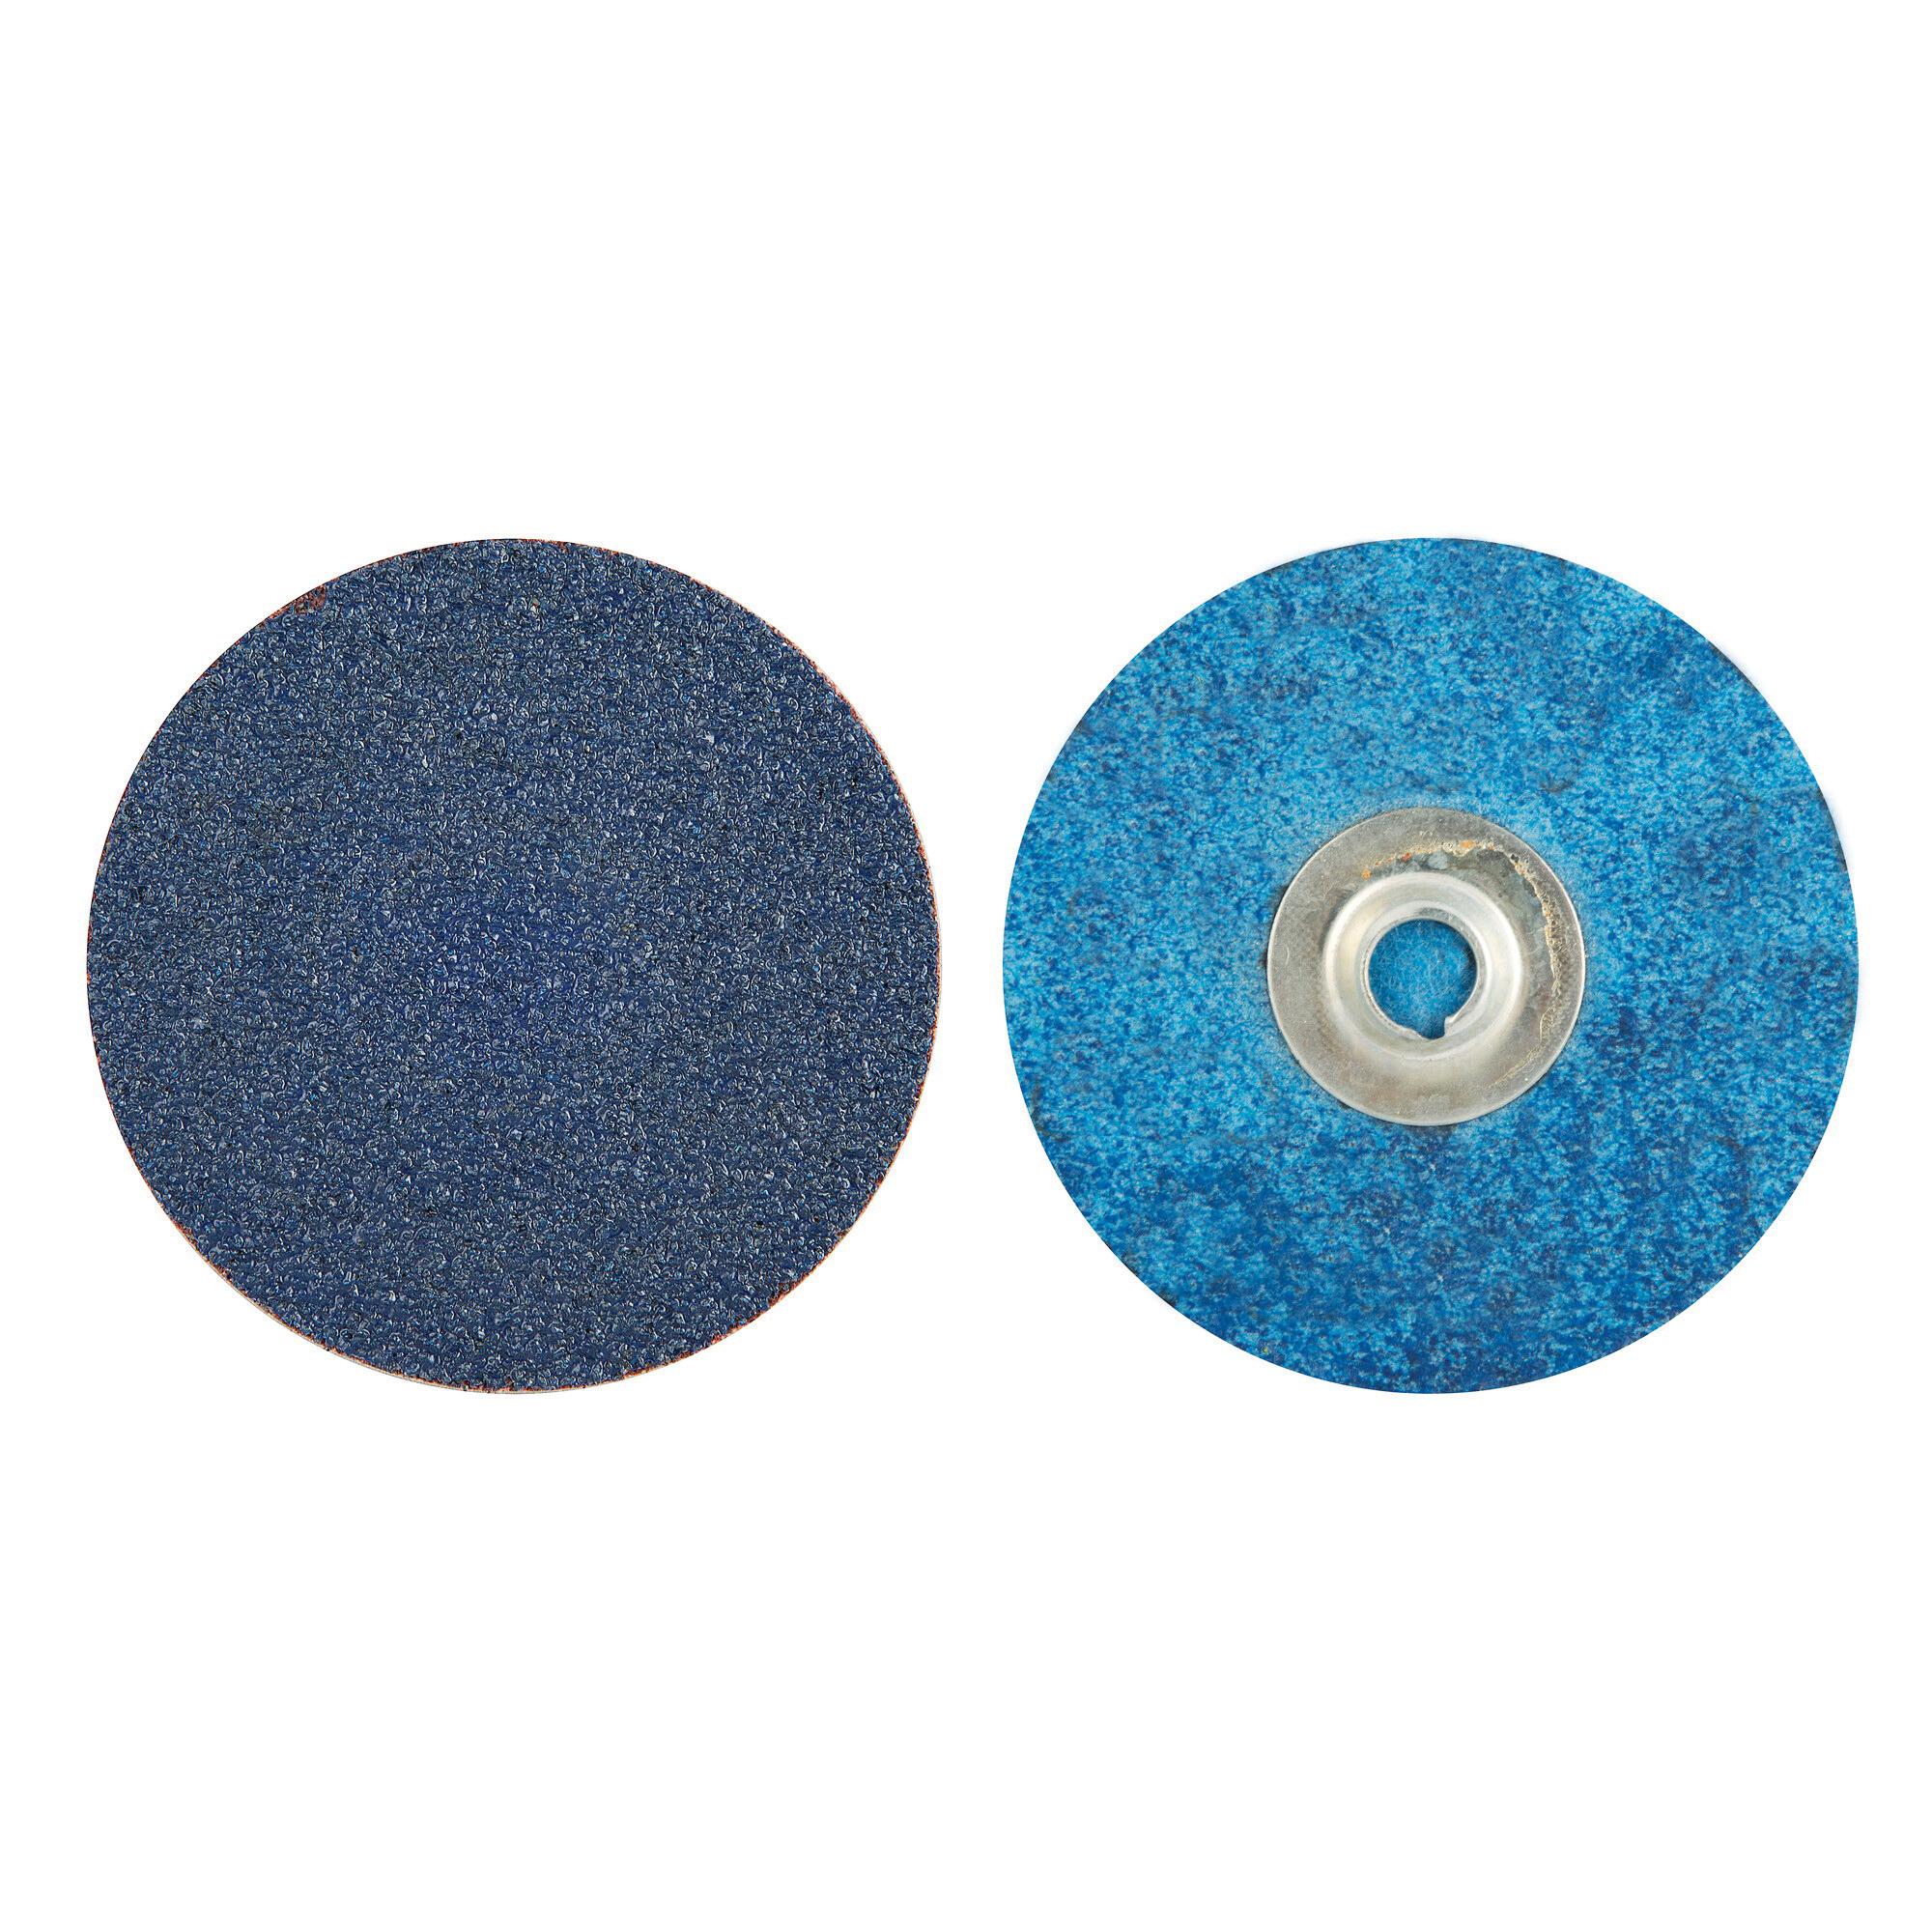 Norton® BlueFire® 66261138660 R884P Coated Abrasive Quick-Change Disc, 3 in Dia, 80 Grit, Coarse Grade, Zirconia Alumina Abrasive, Type TS (Type II) Attachment